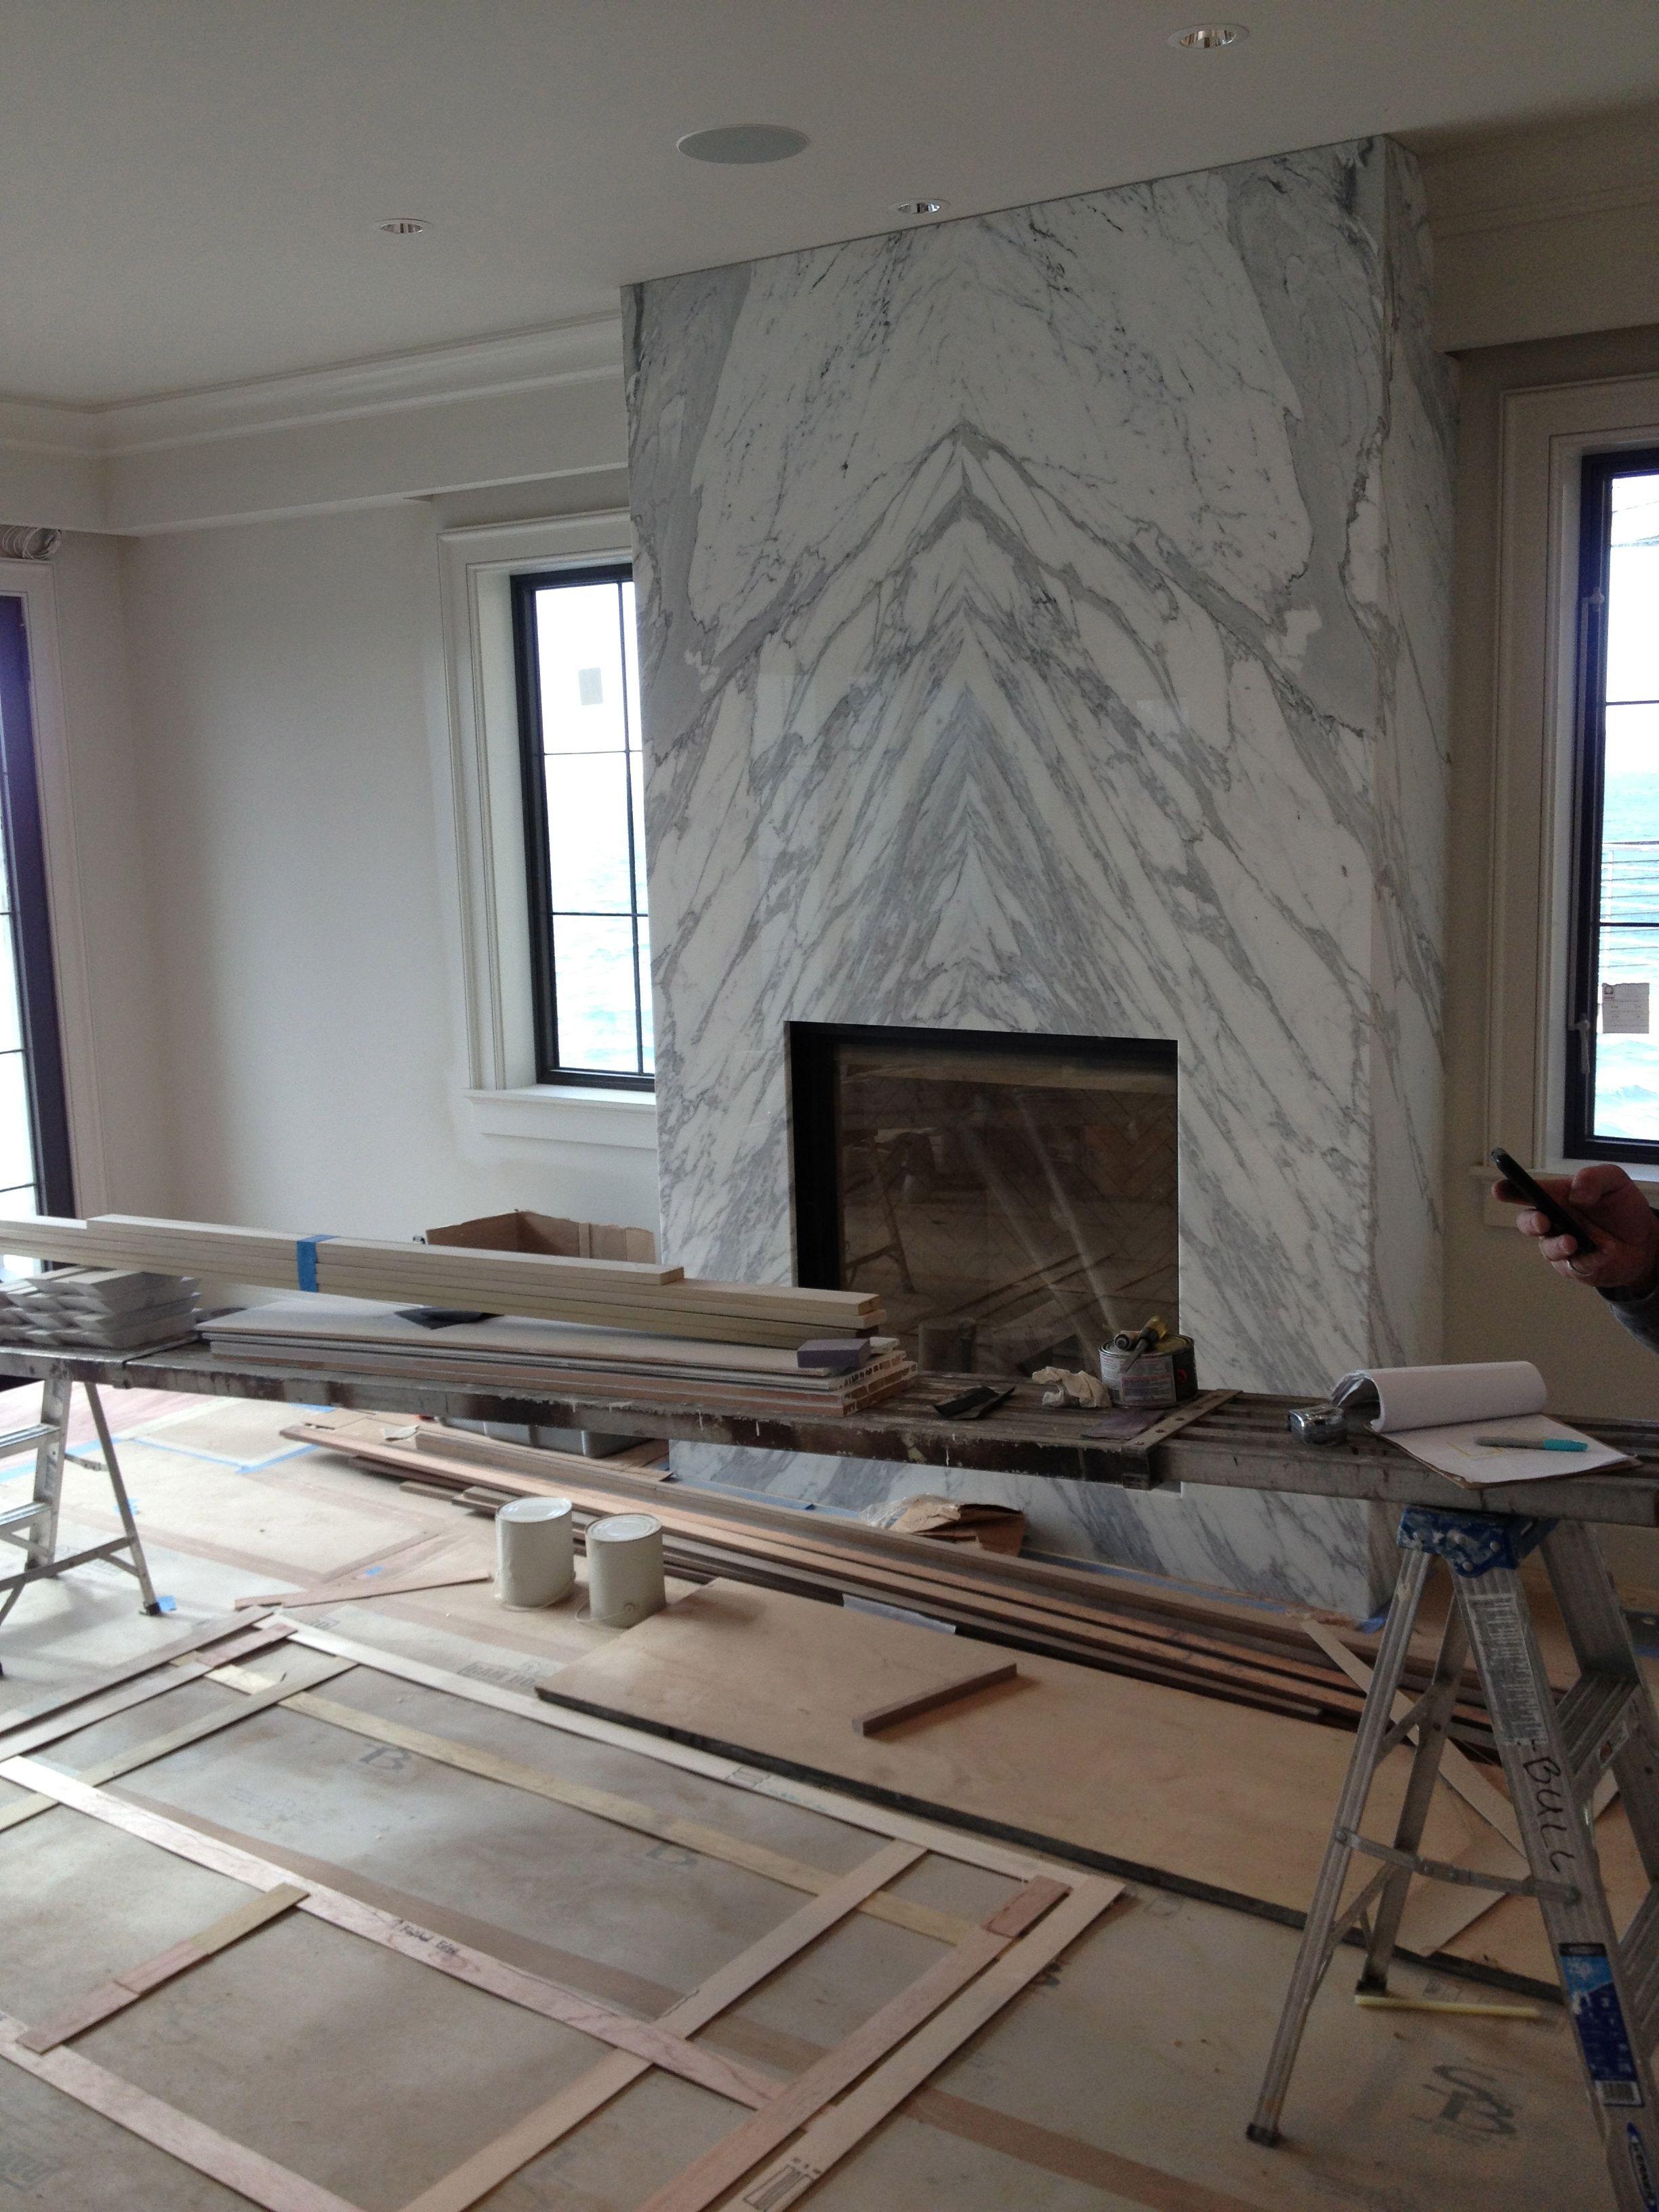 Fireplace Drawing Inspirational Contemporary Slab Stone Fireplace Calacutta Carrara Marble